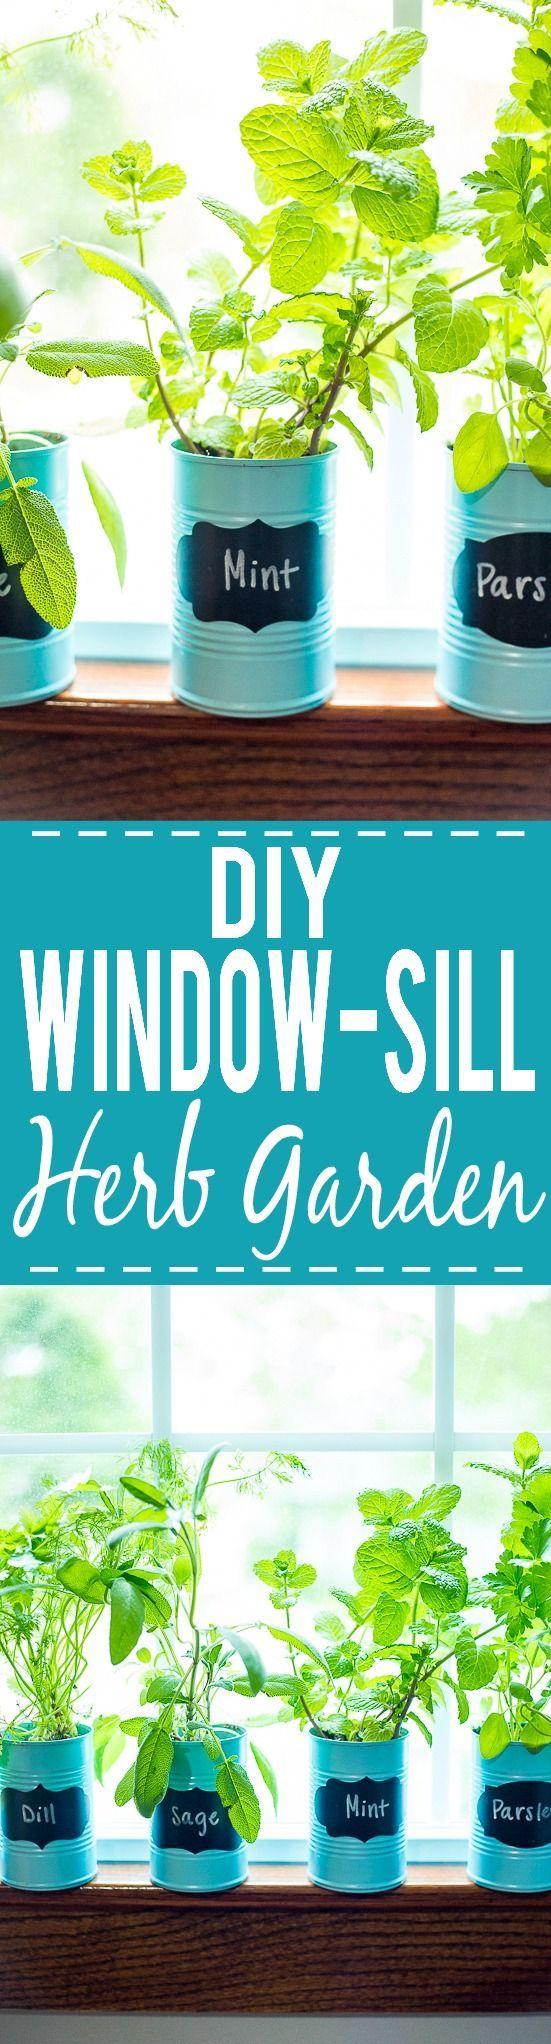 How to Make an Indoor Window Sill Herb Garden